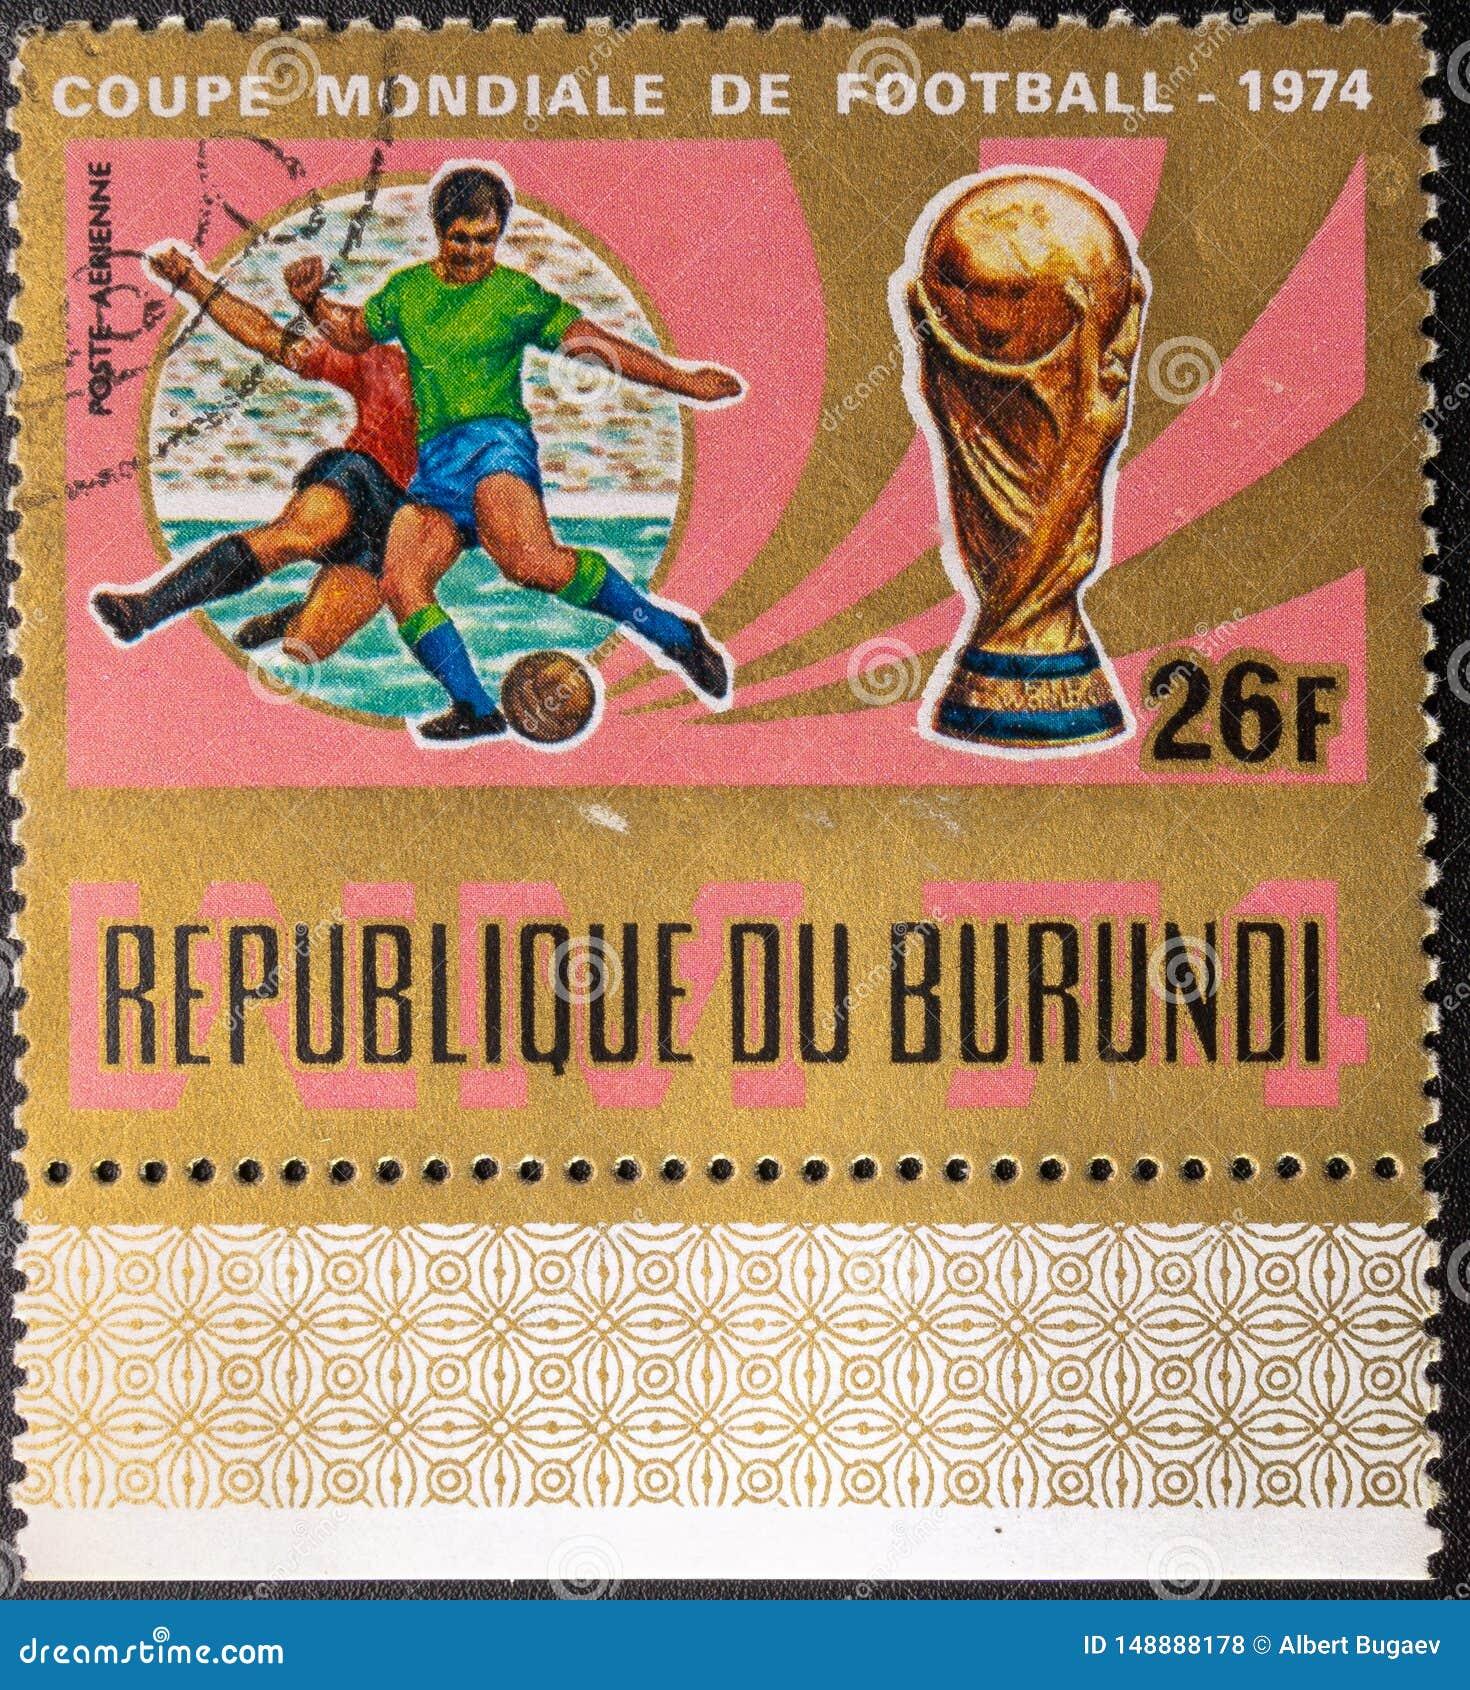 Selo postal 1974 Copo de mundo Futebol Rep?blica do Burundi